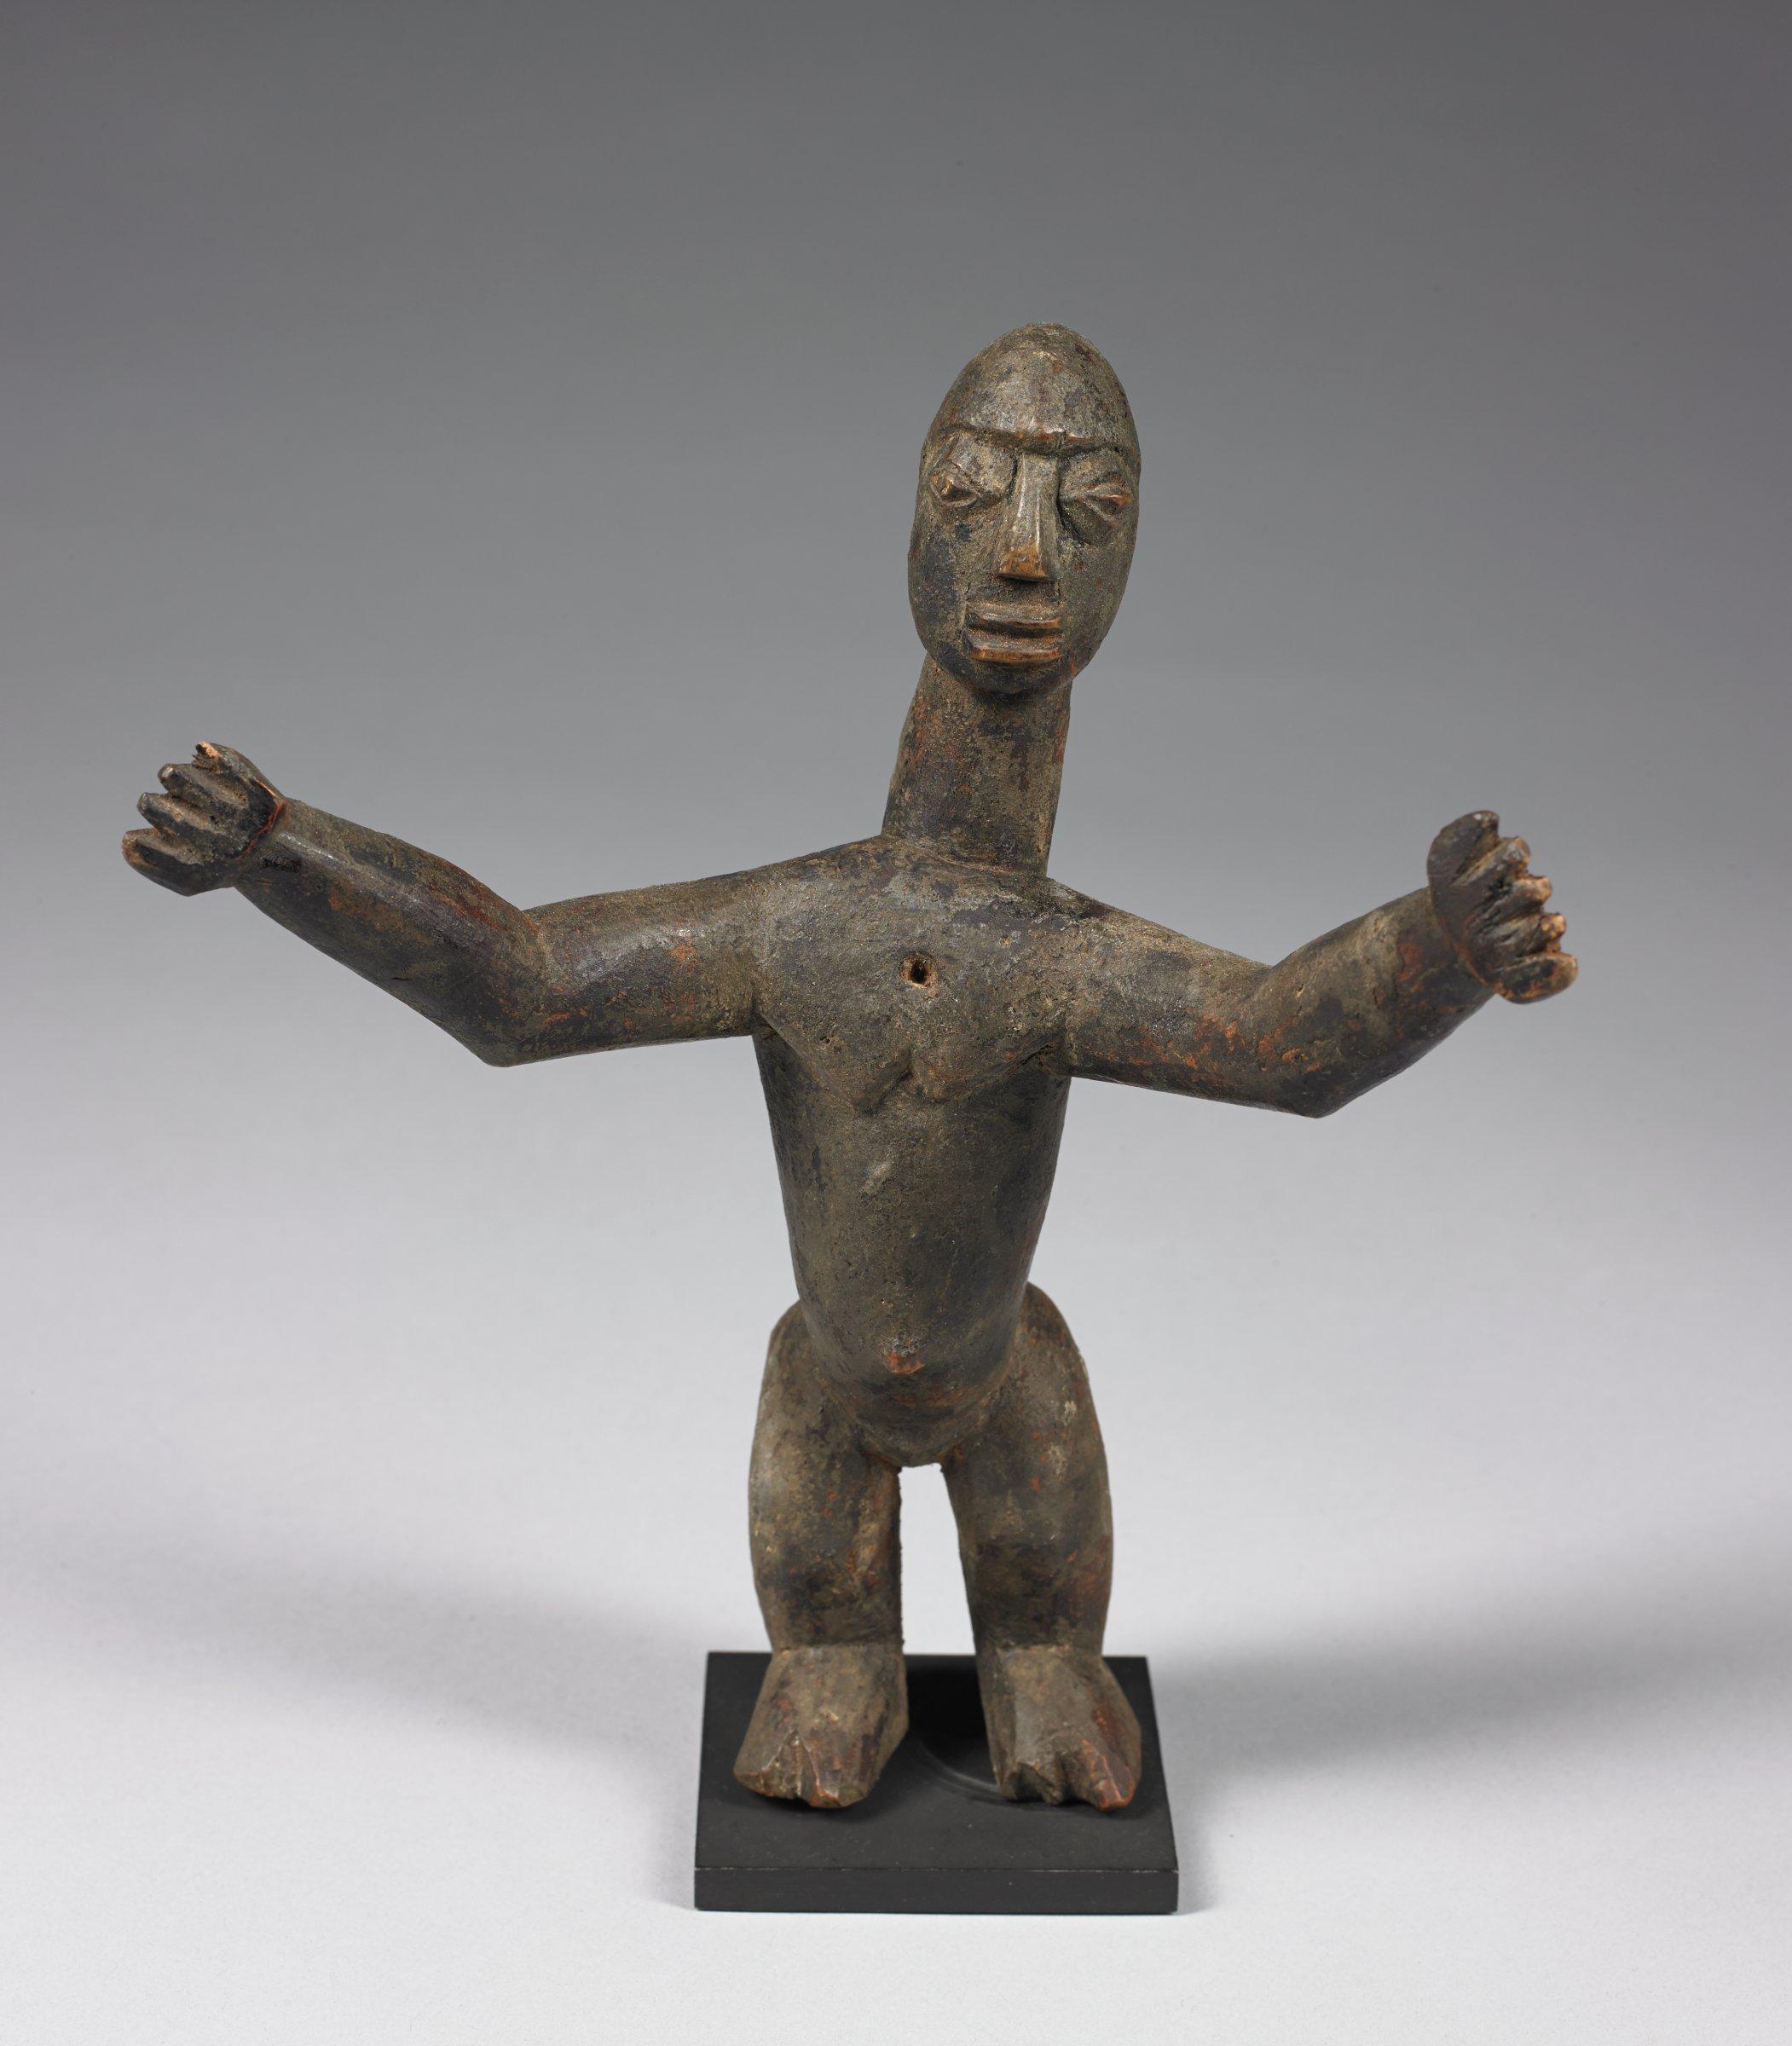 Female Figure, Lobi people, Burkina Faso, African, wood, encrustation